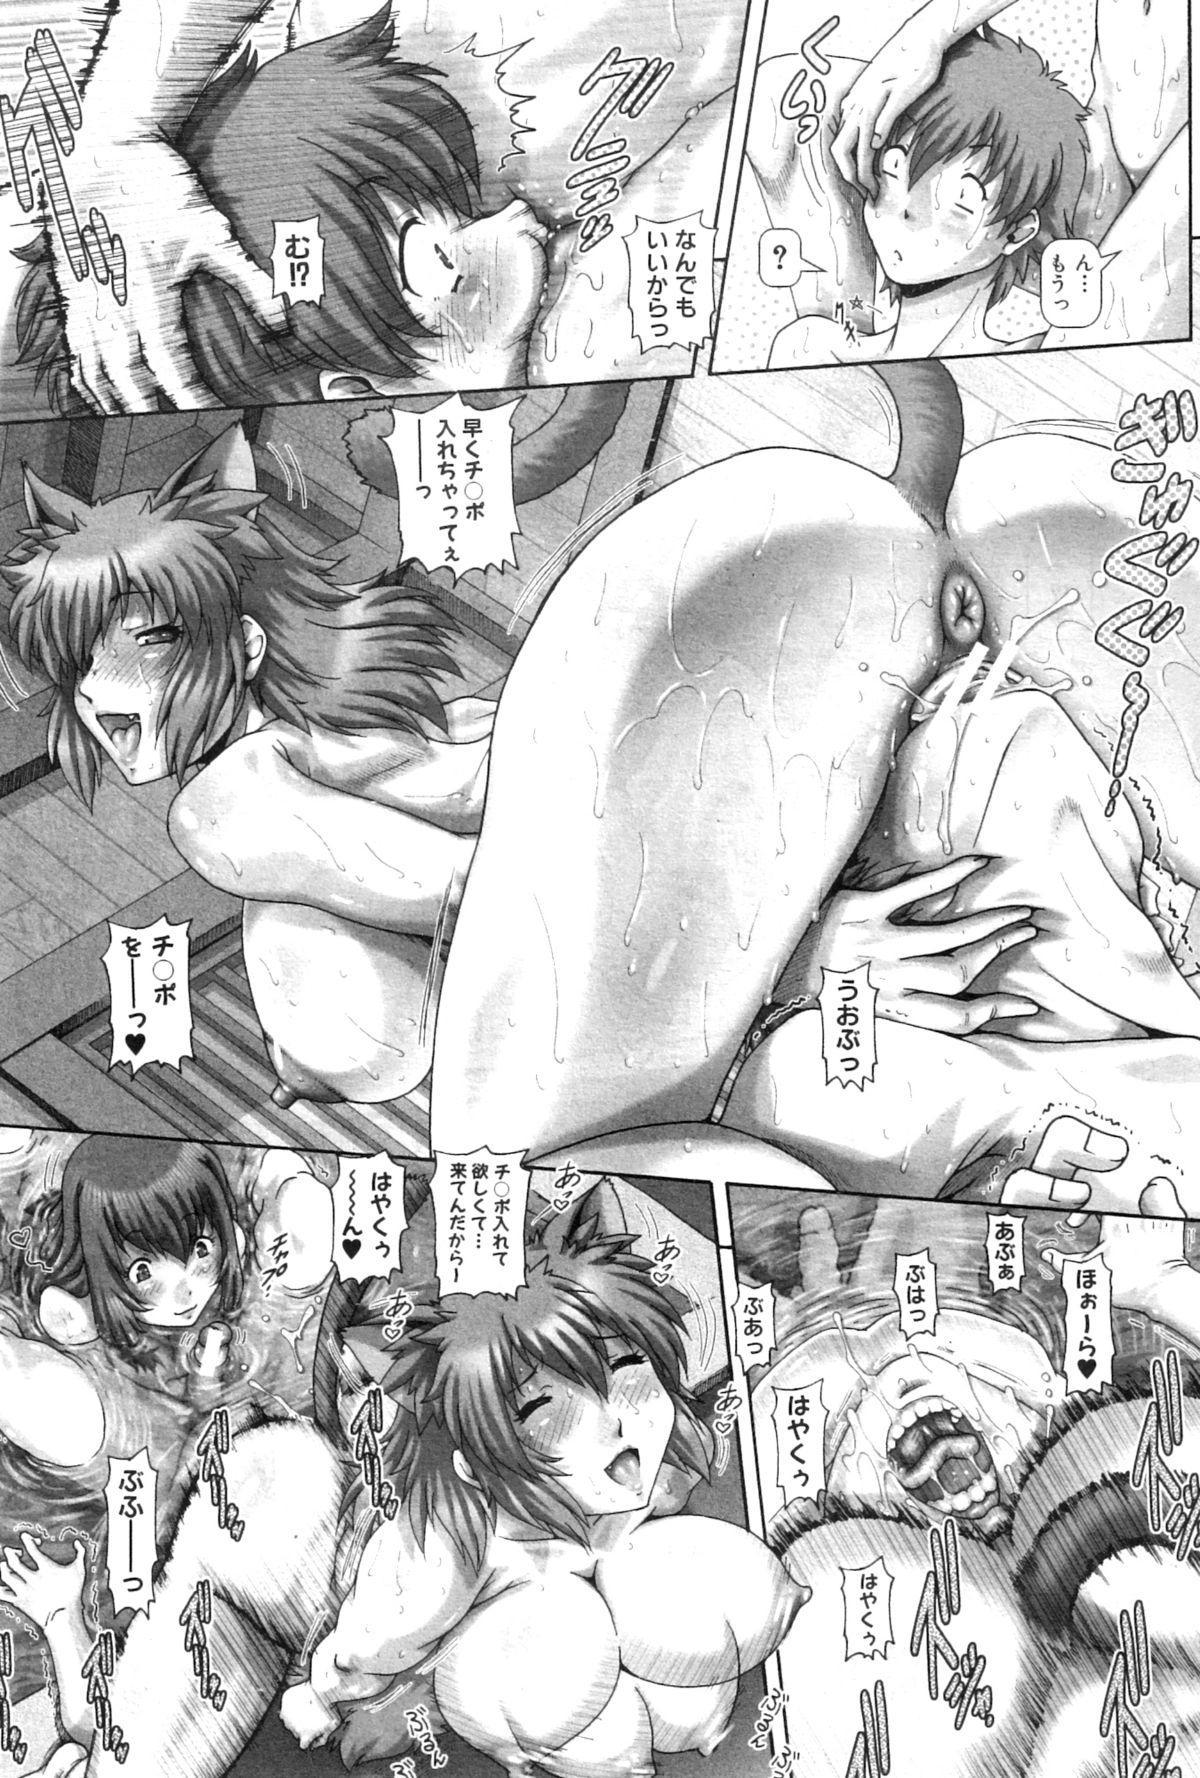 COMIC MILF 2013-02 Vol. 11 41